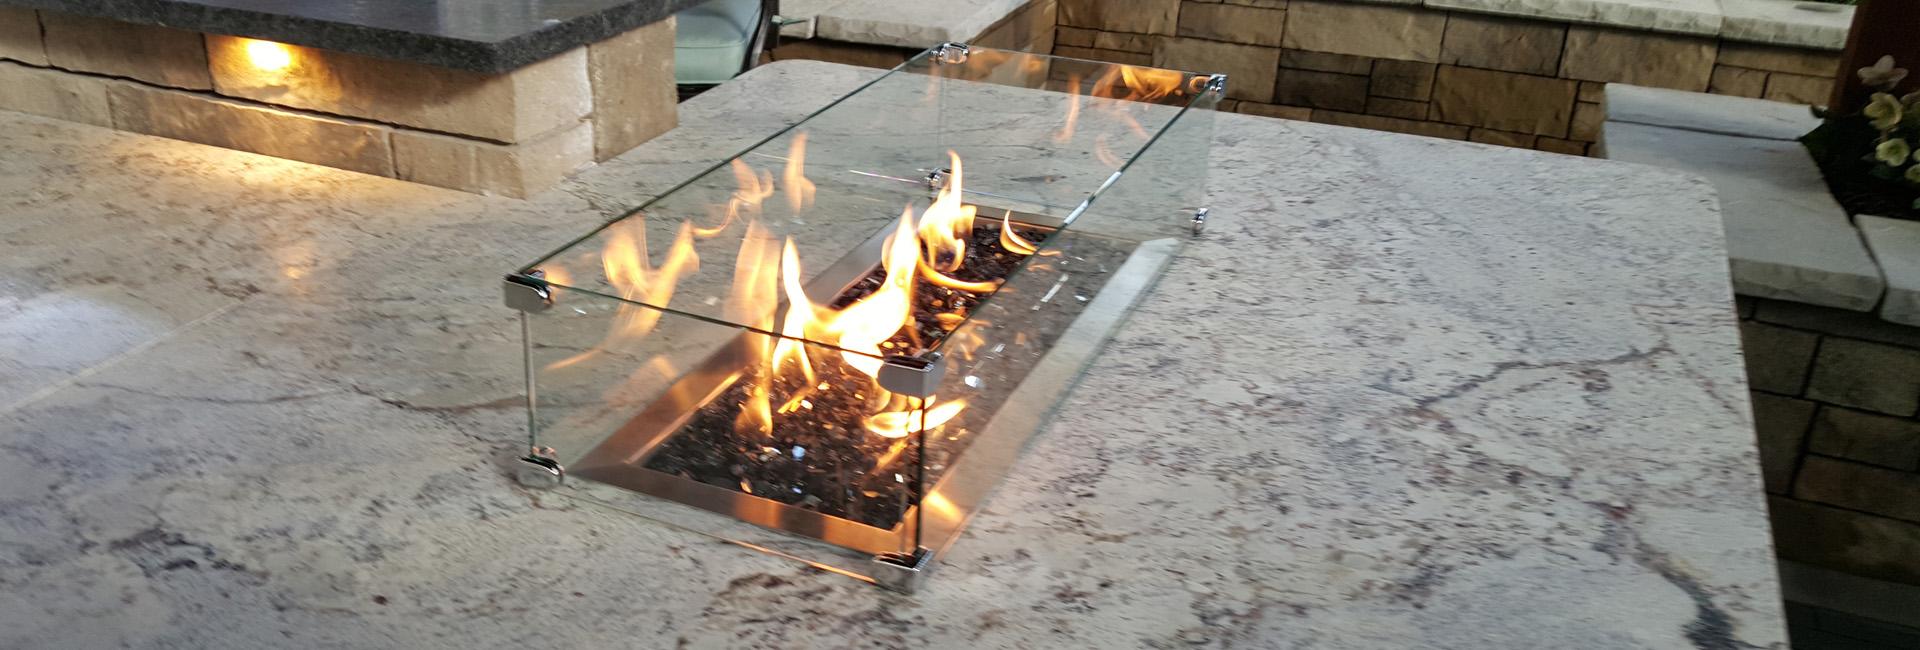 fireboulder-fire-pit-granite-wind-guards-fire-pan